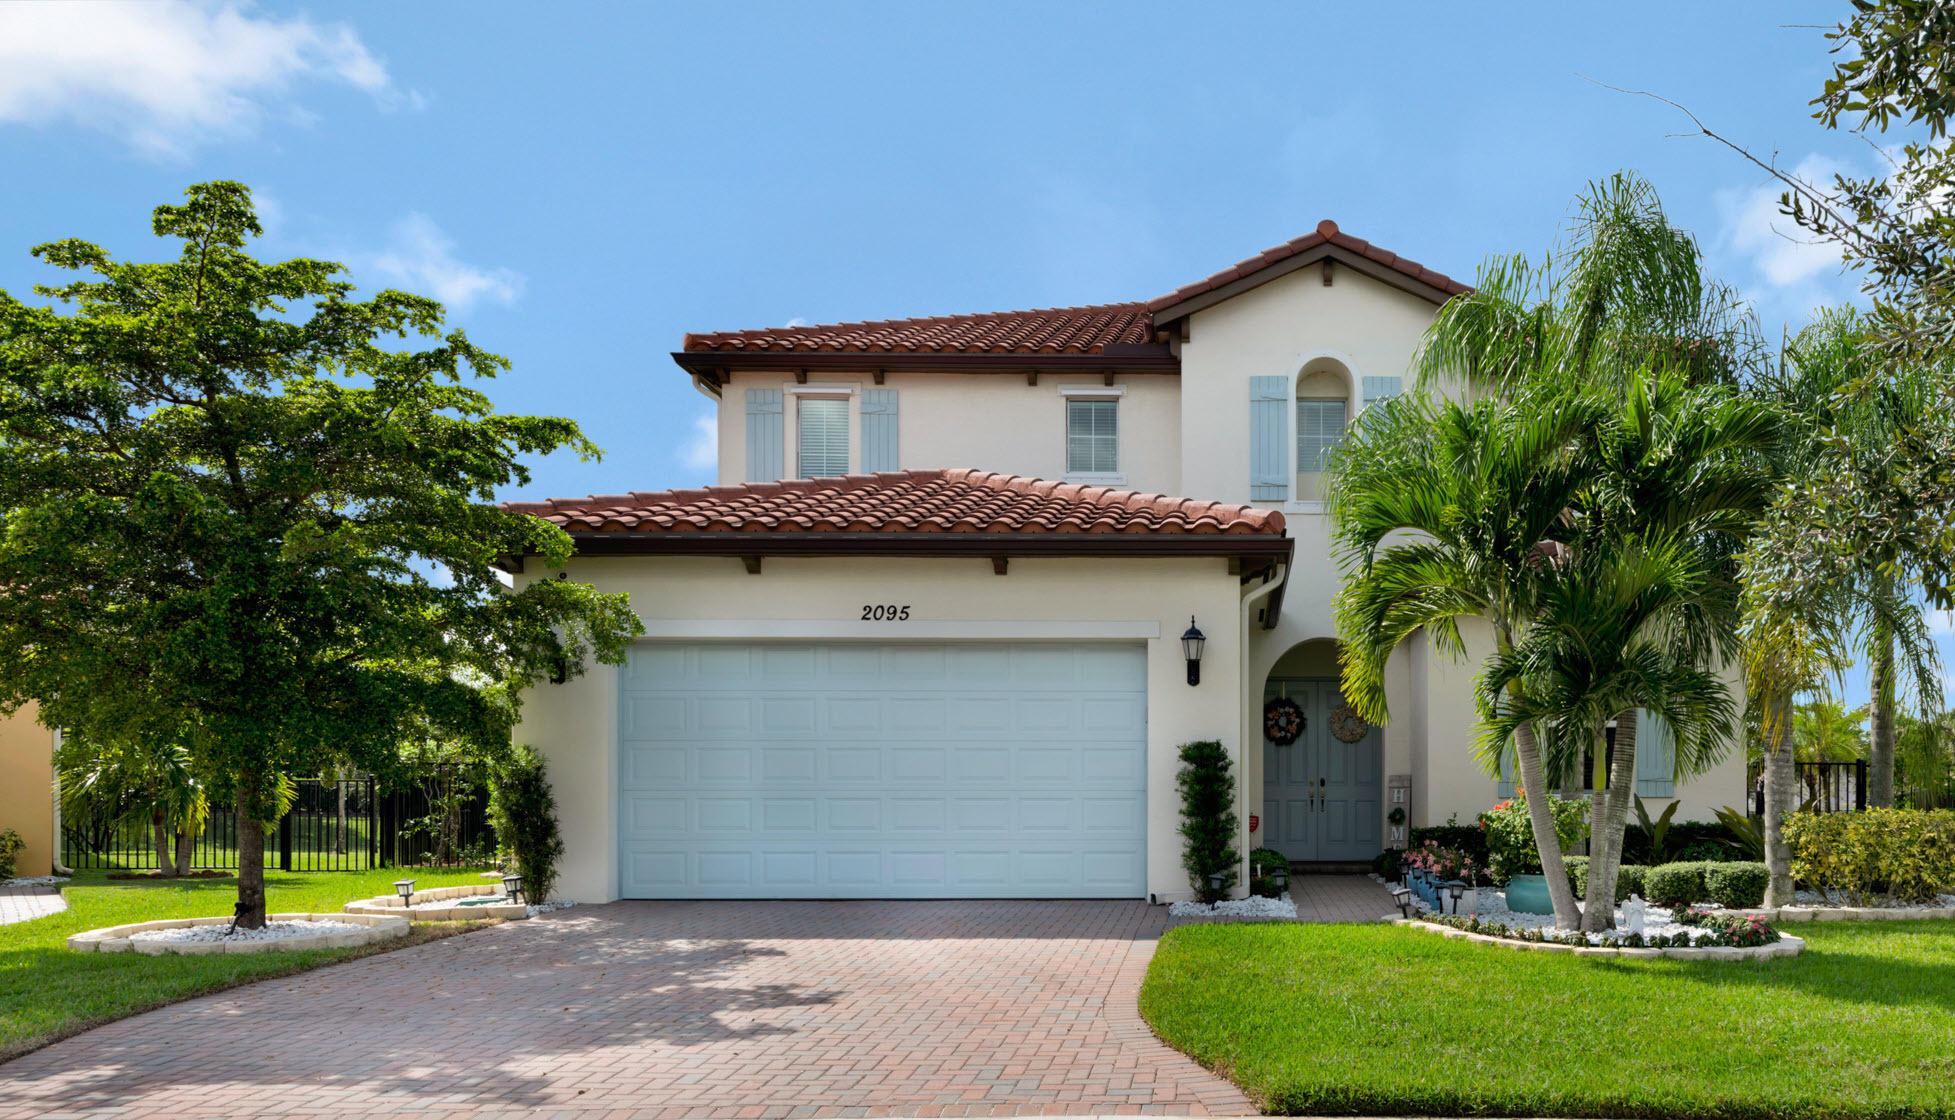 2095 Belcara Court Royal Palm Beach, FL 33411